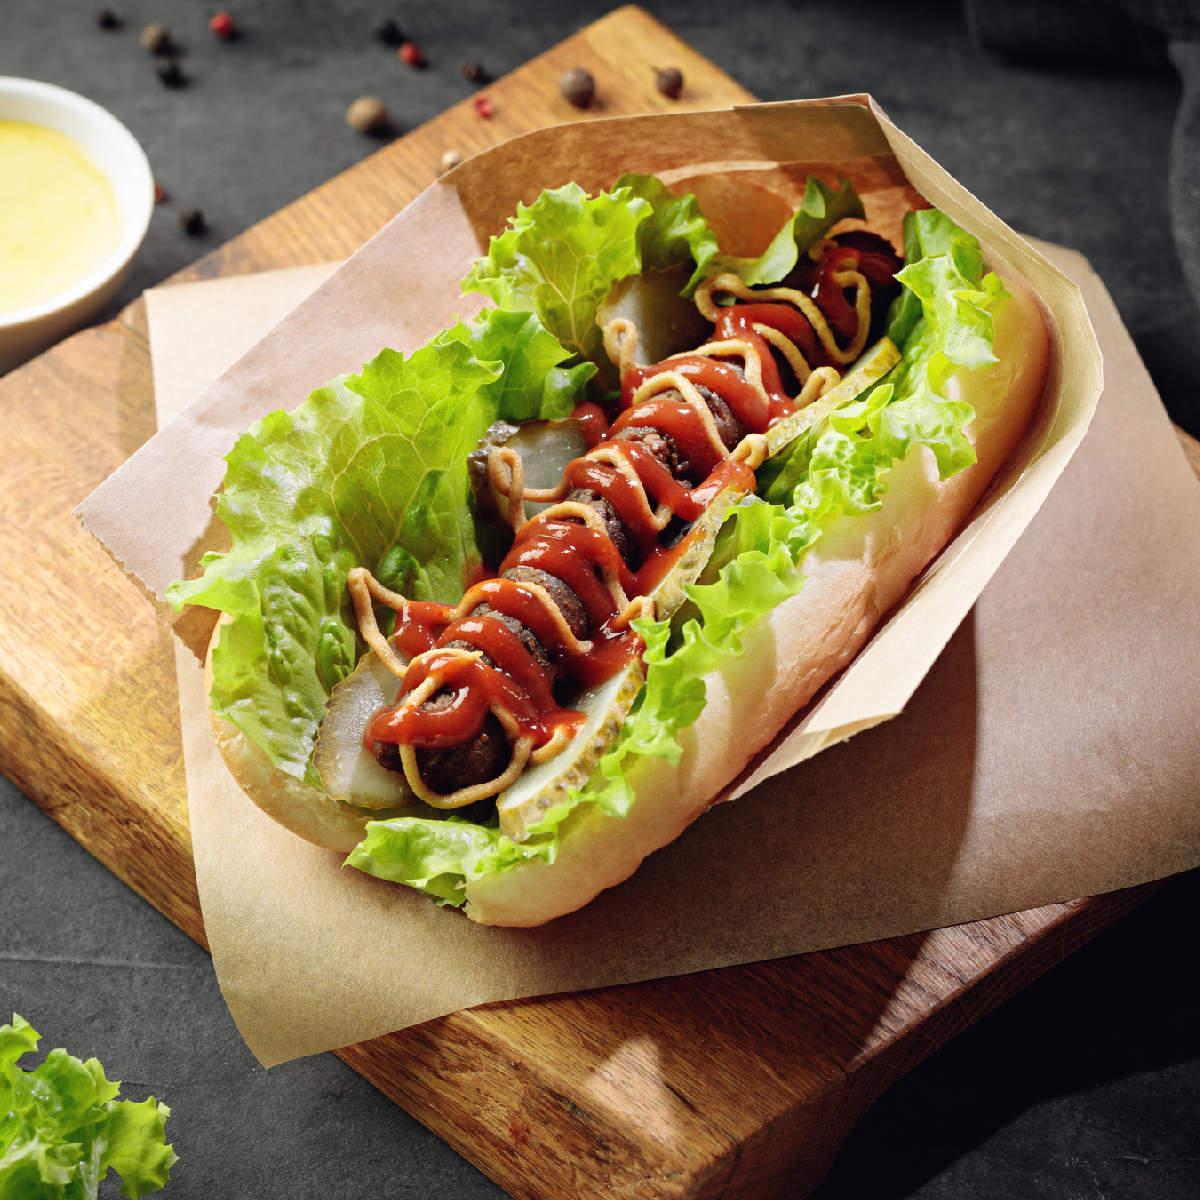 Vegetable Hot Dog Recipe How To Make Vegetable Hot Dog Recipe Homemade Vegetable Hot Dog Recipe